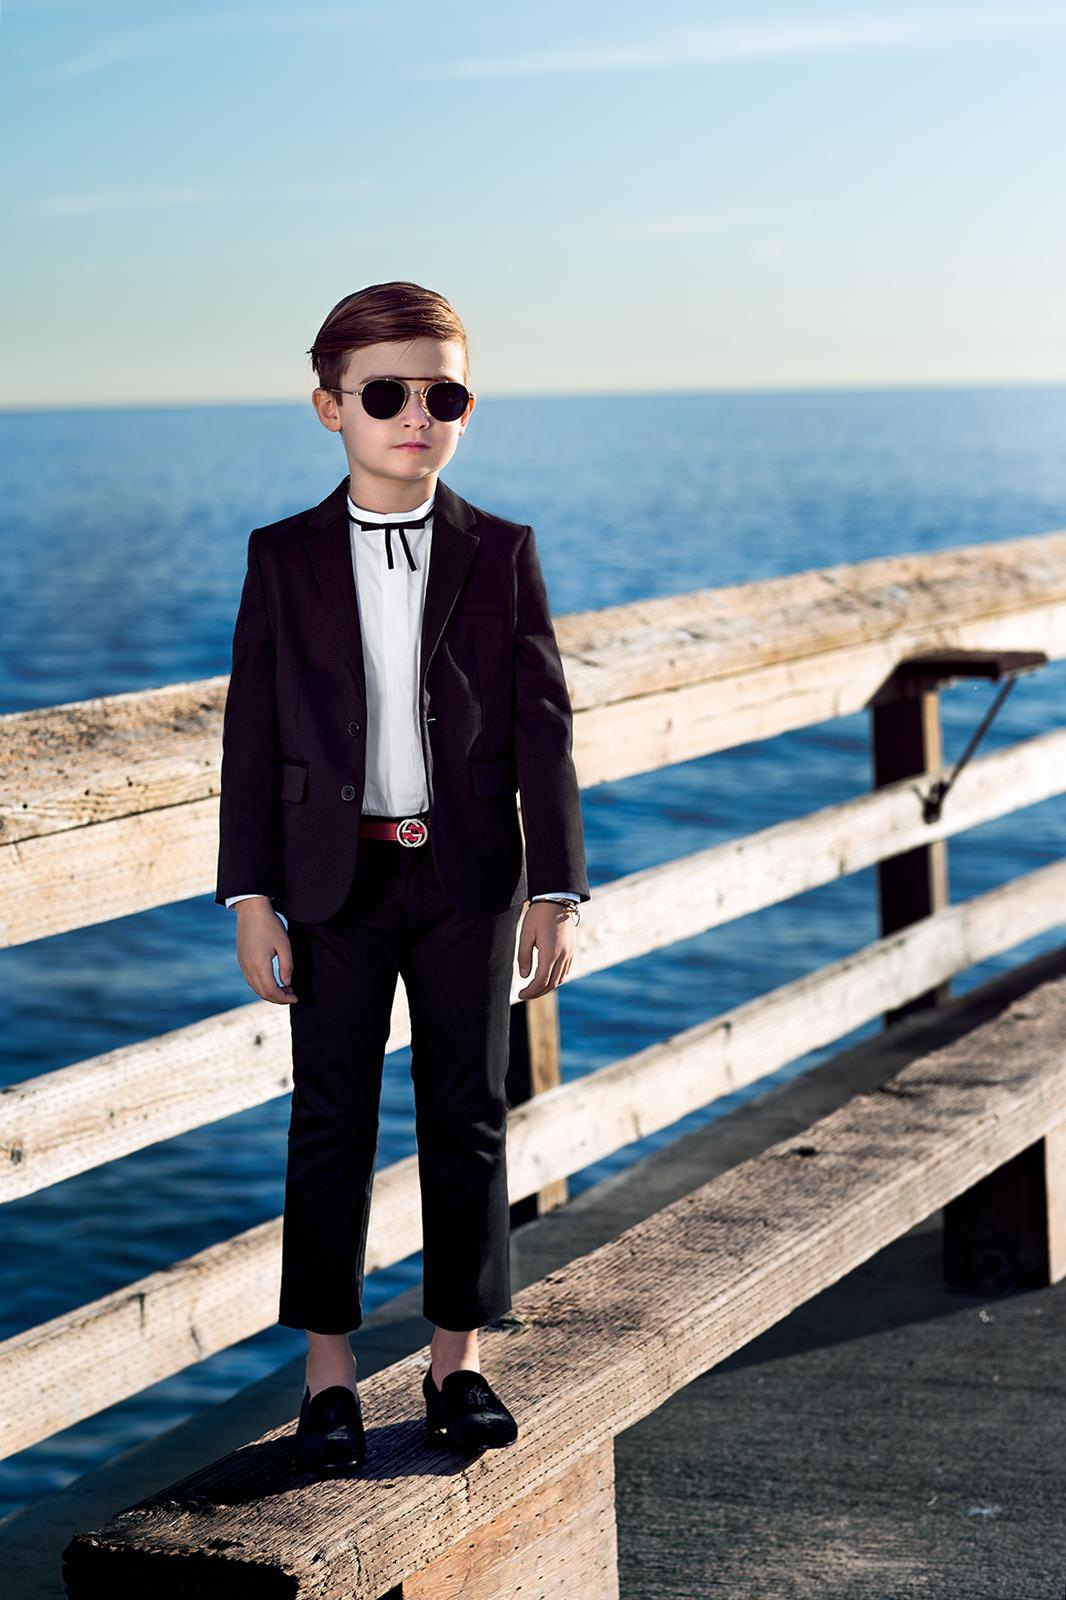 kids_fashion_felicidad_de_lucas_photographer_017.jpg